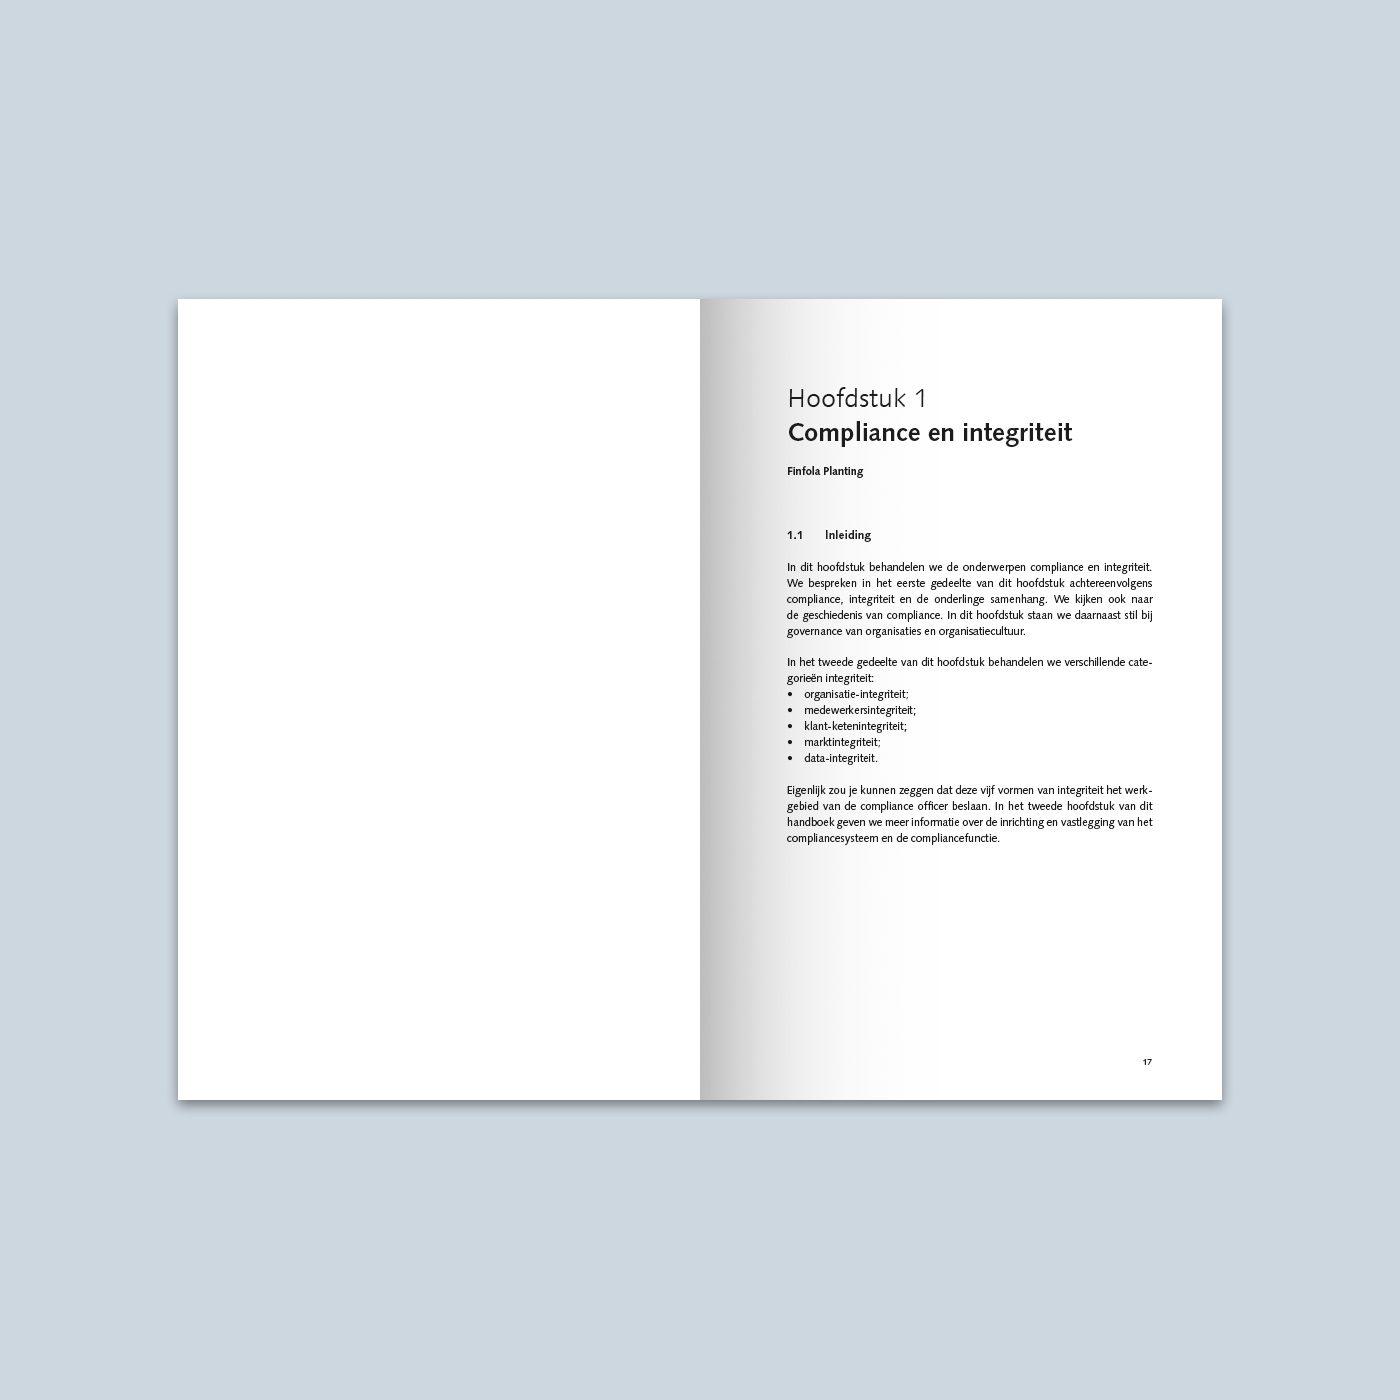 Handboek Compliance Professional 2021 binnenwerk 3